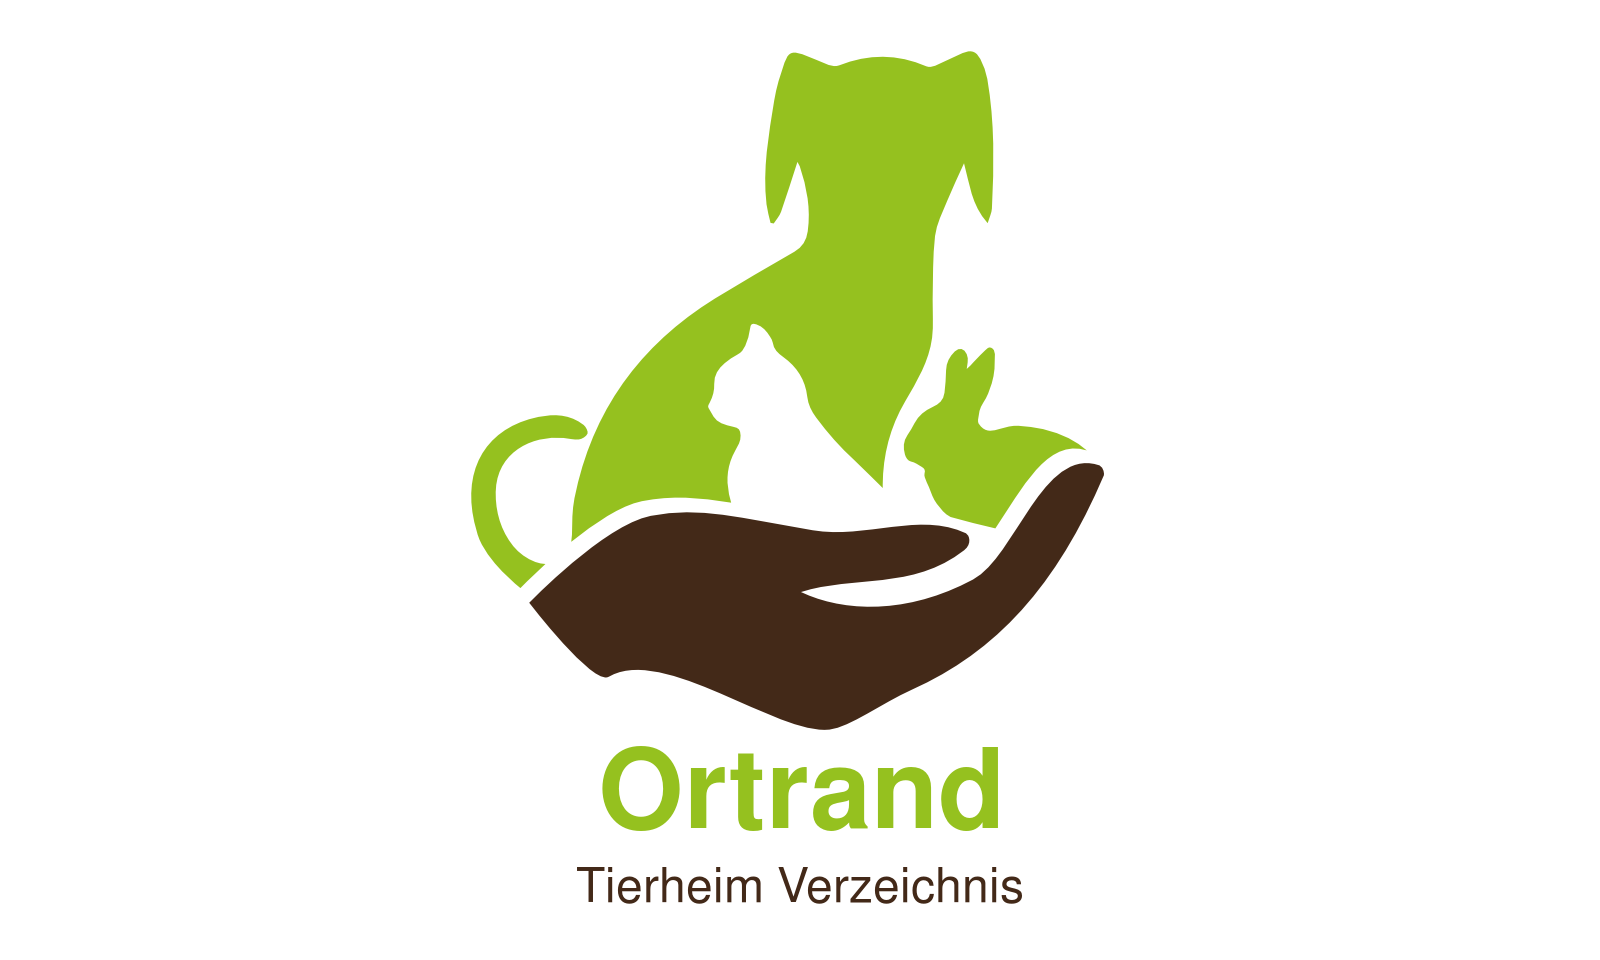 Tierheim Ortrand